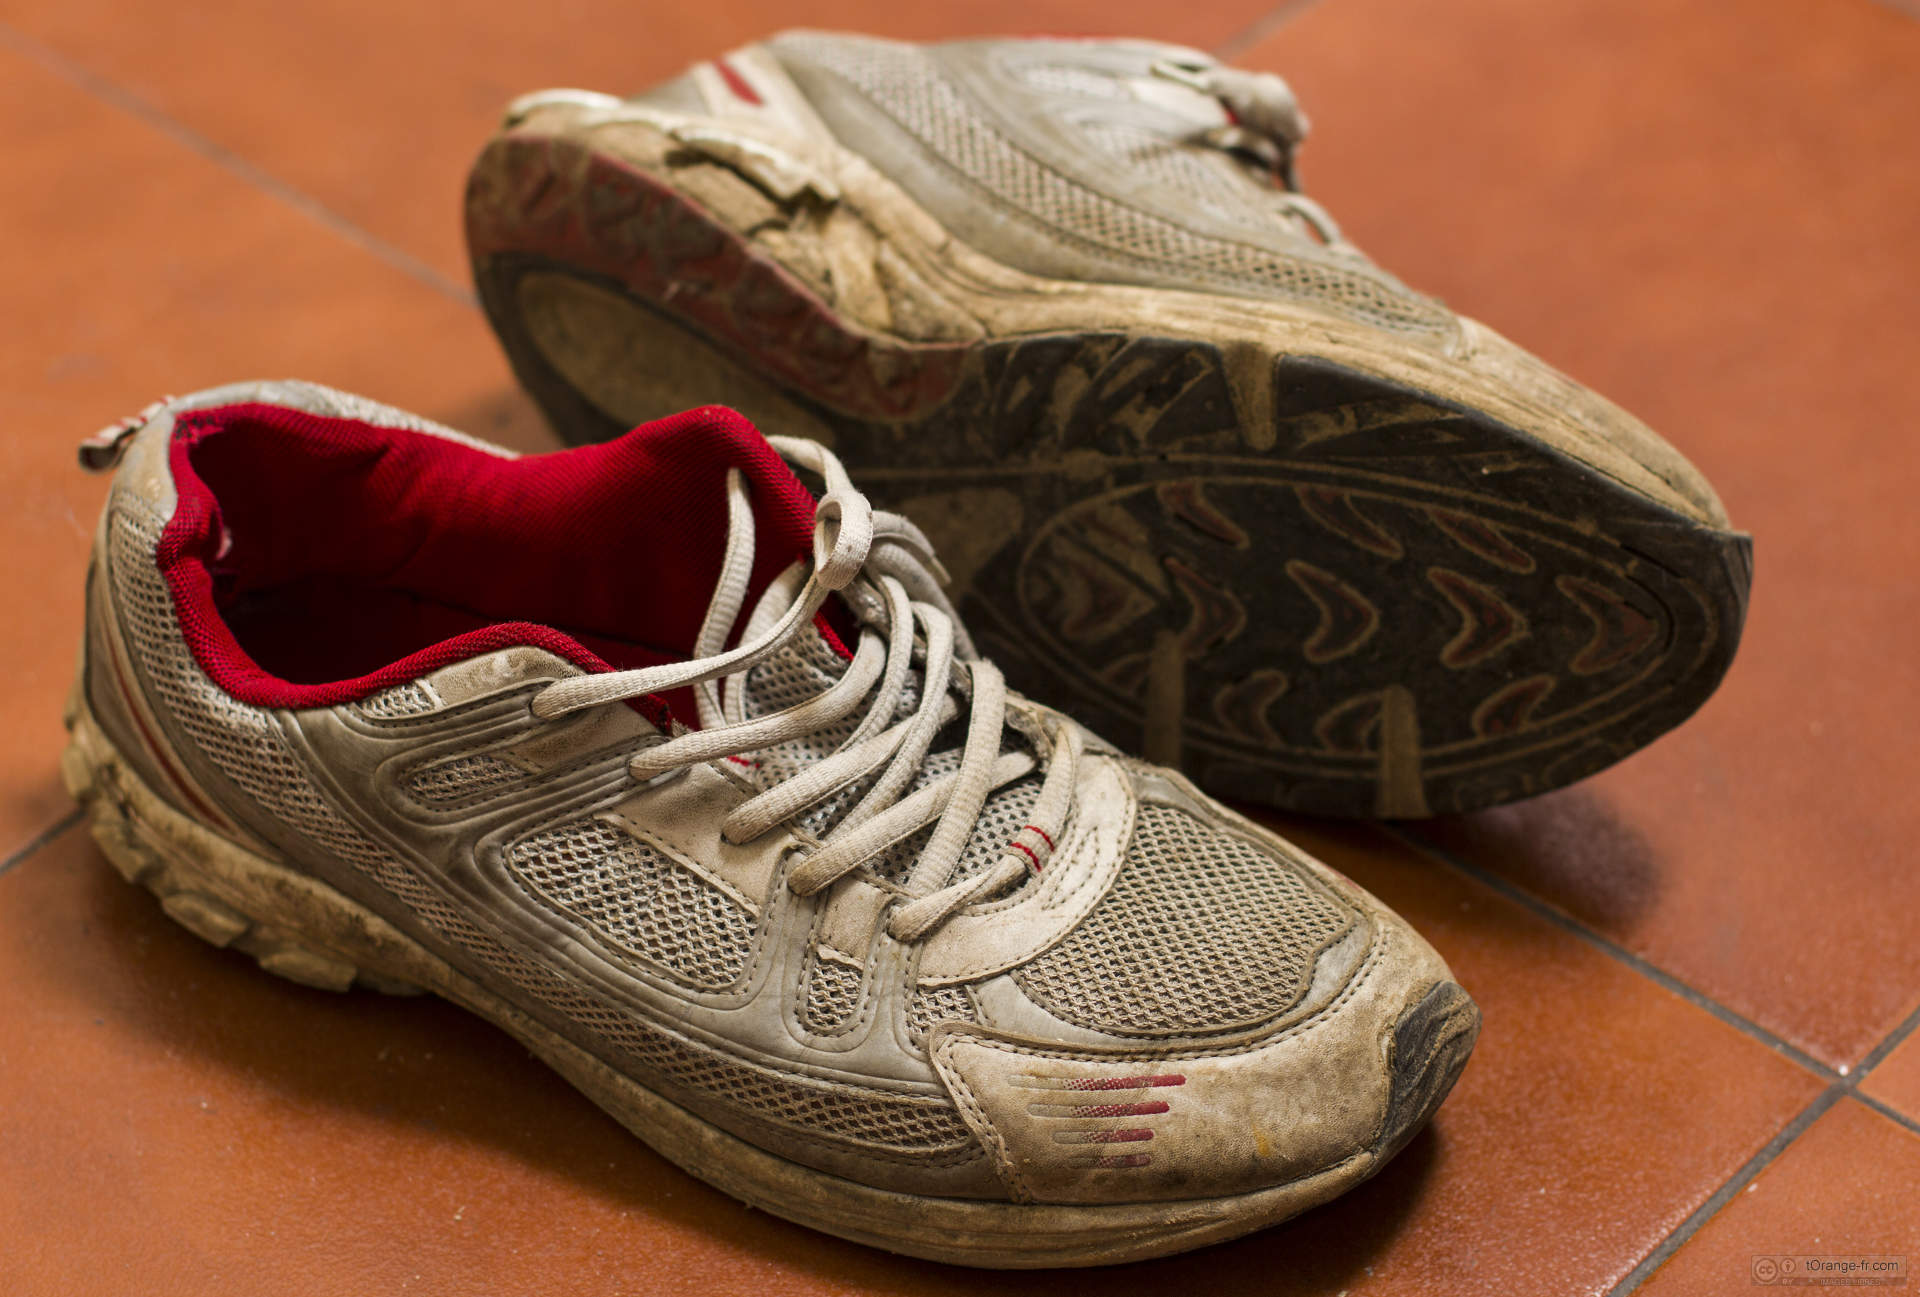 Choisir ses chaussures de Squash: nos conseils